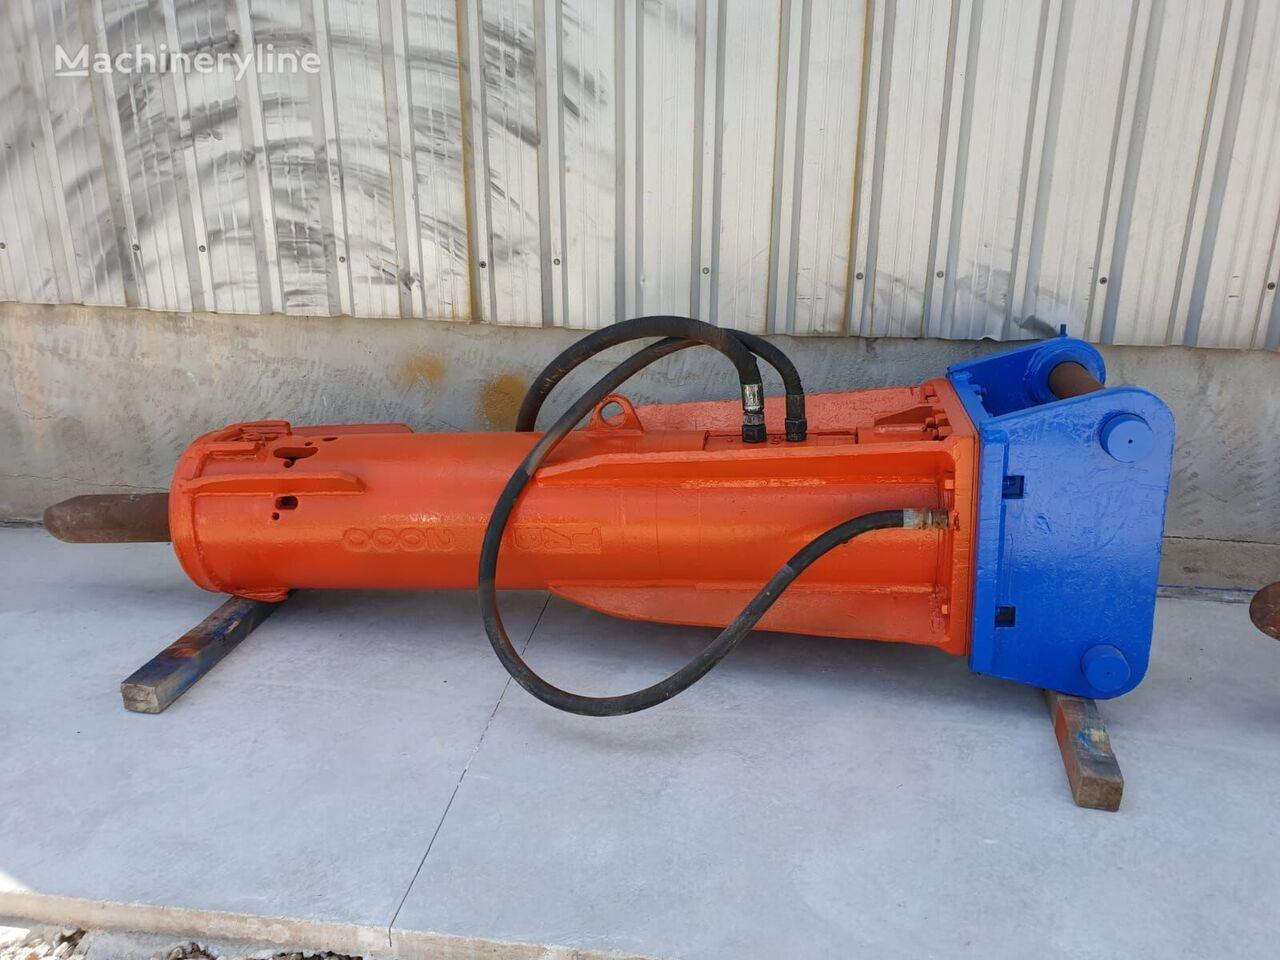 TABE 2000 hydraulic breaker